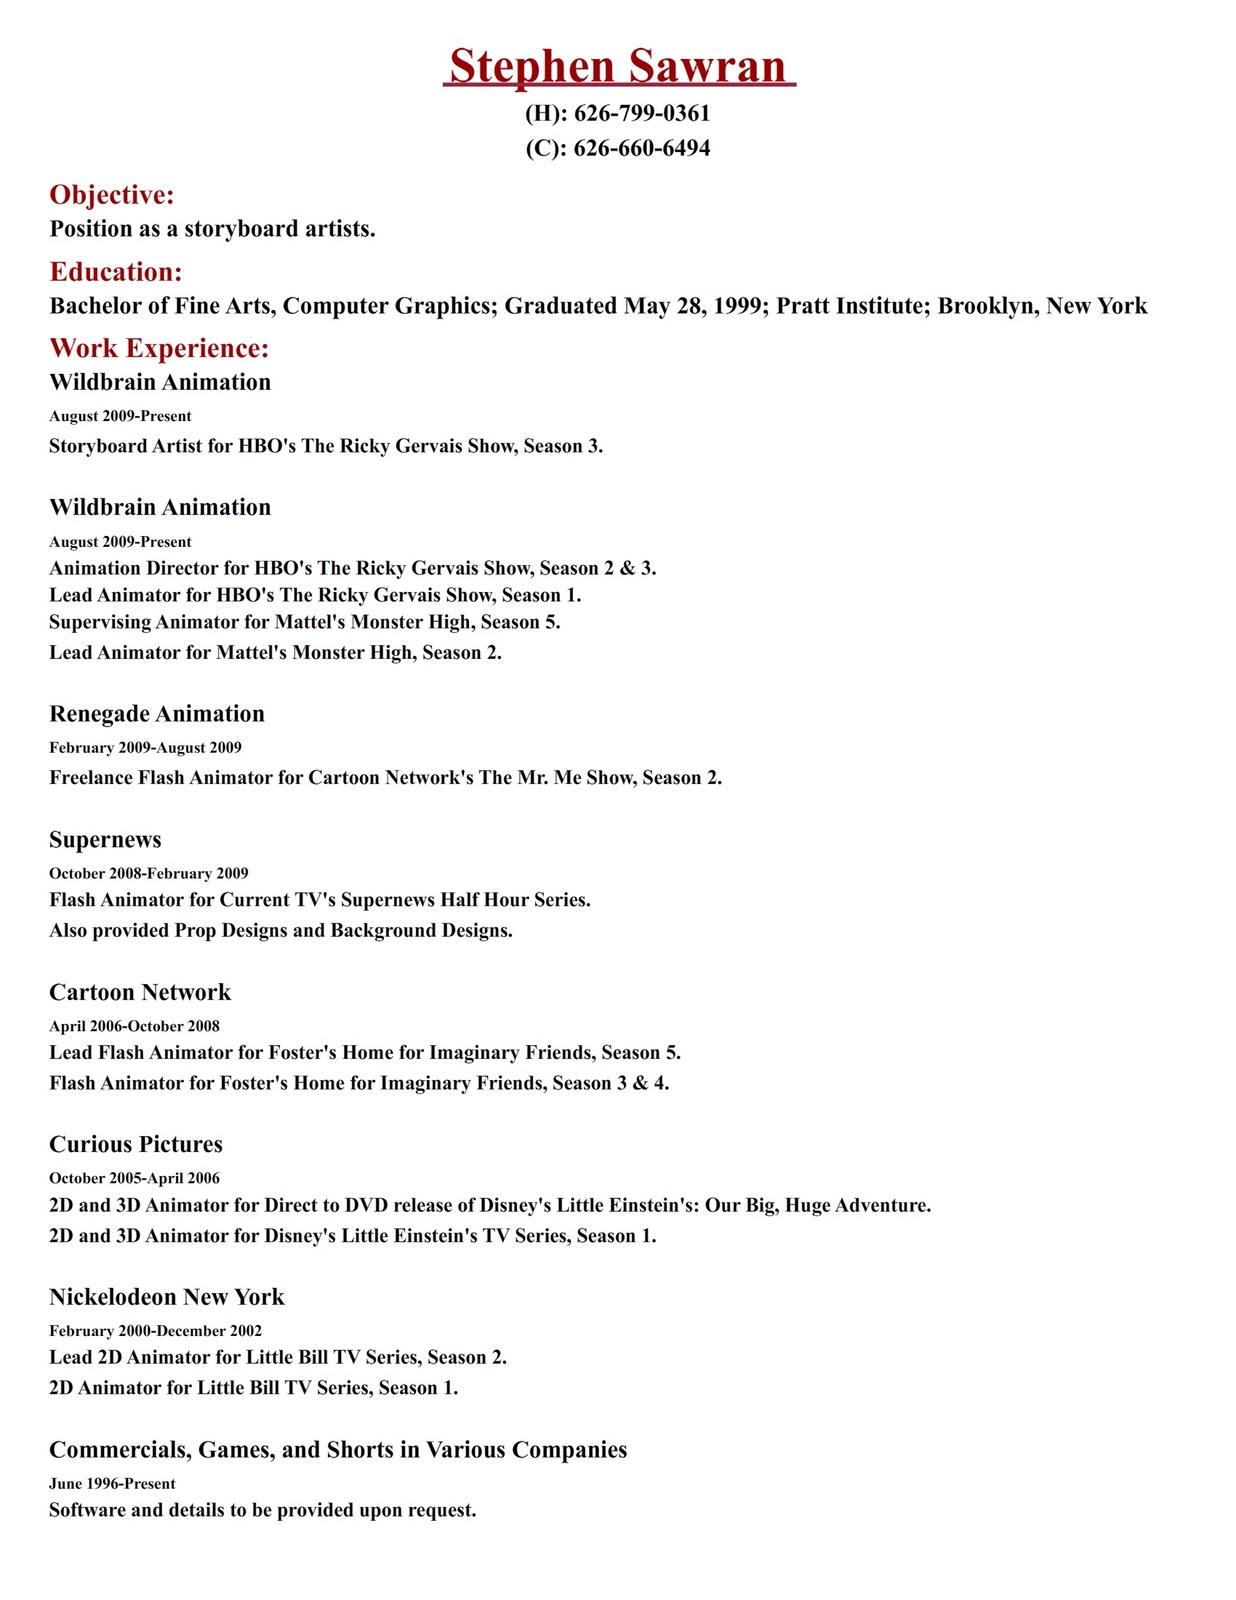 stephen sawran resume